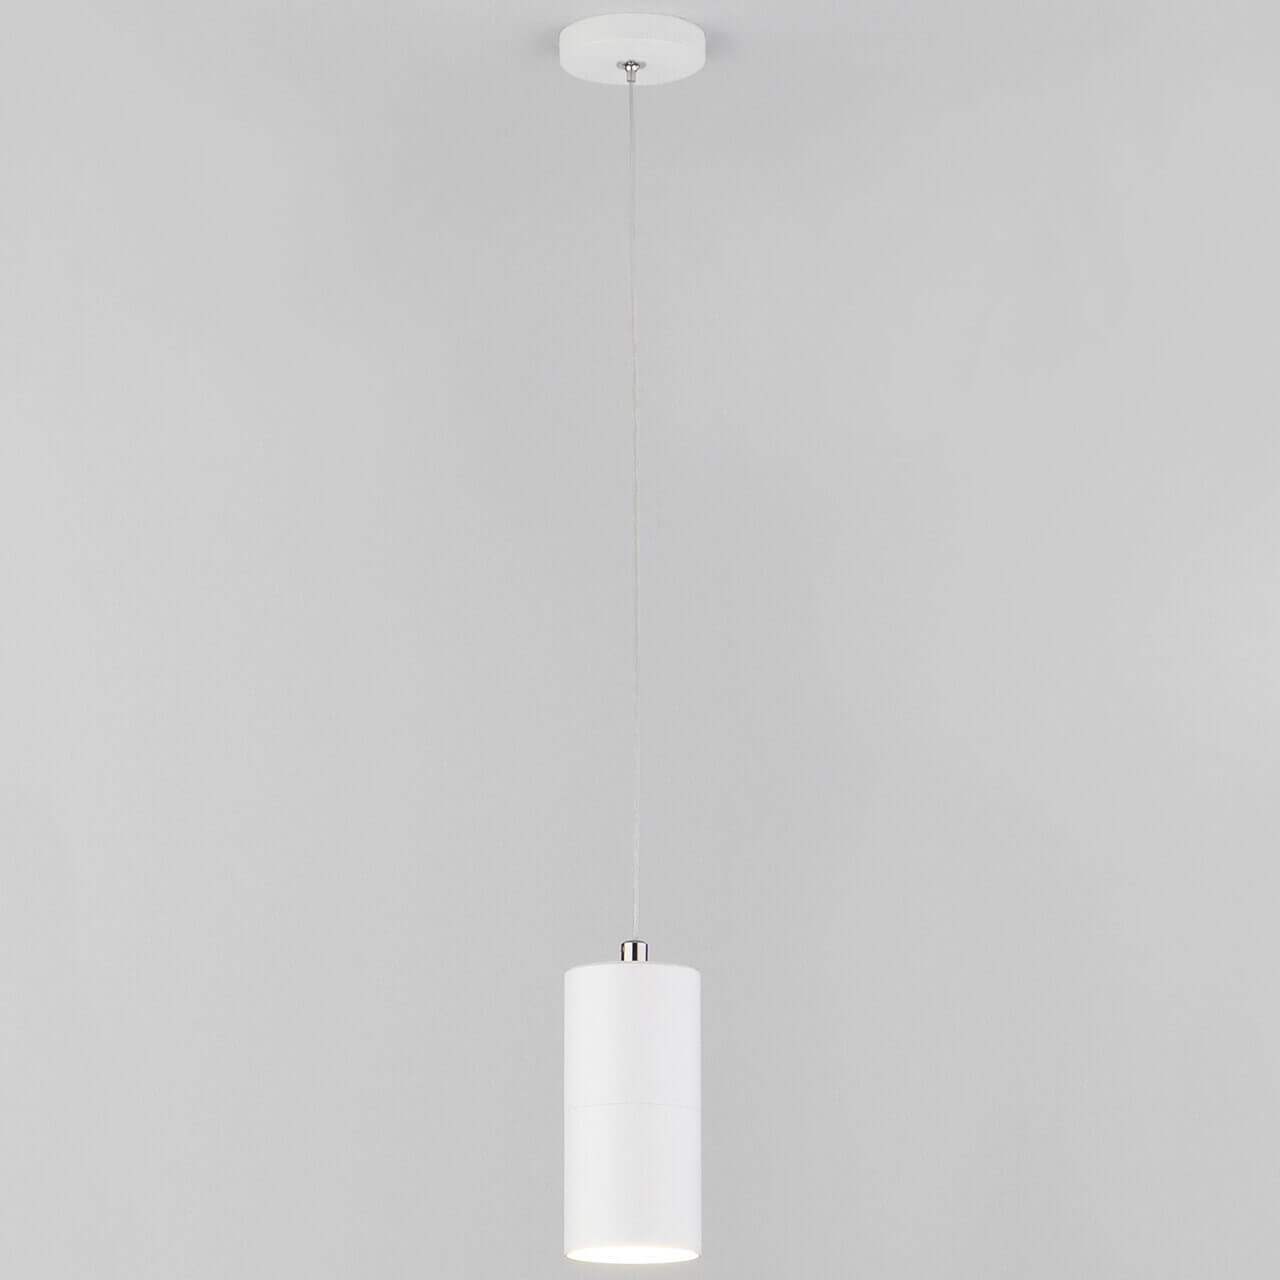 Светильник Eurosvet 50146/1 белый Mini Topper